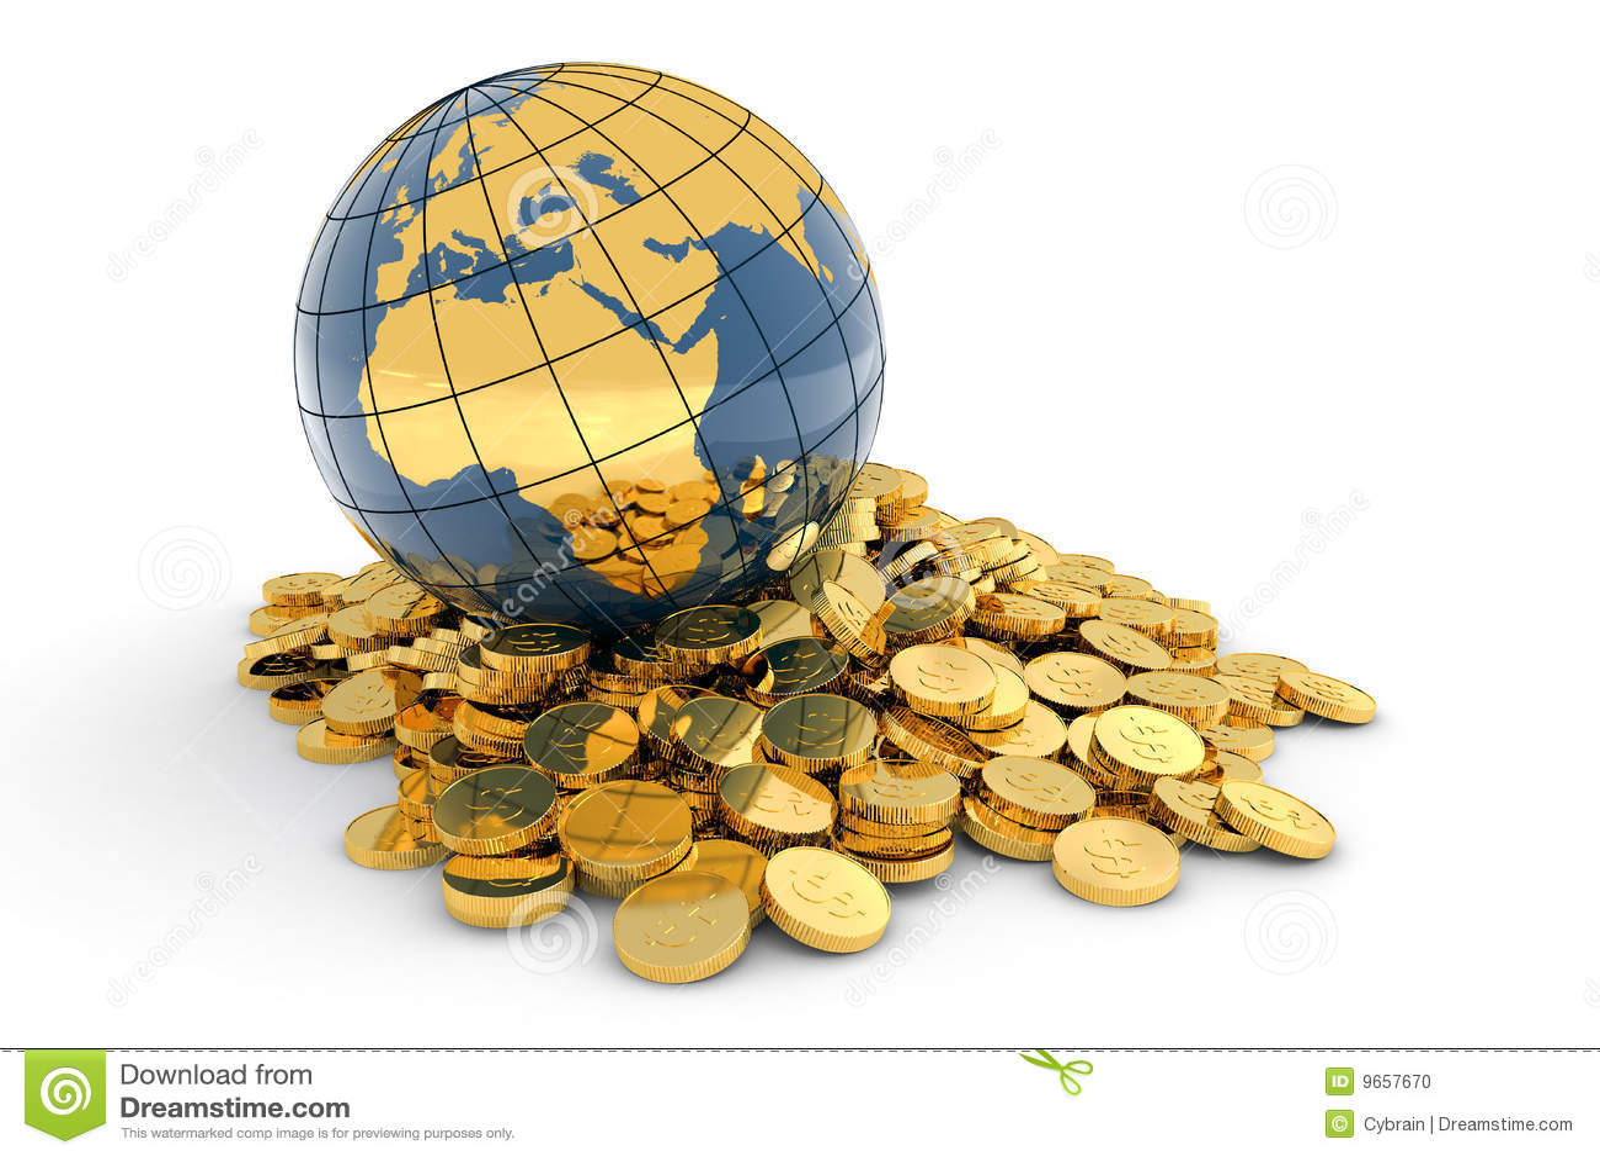 global finance Global finance names the world's top 50 safest banks 2014 new york, sept 9, 2014 — global finance announced its 23rd ranking of the world's 50 safest banks.